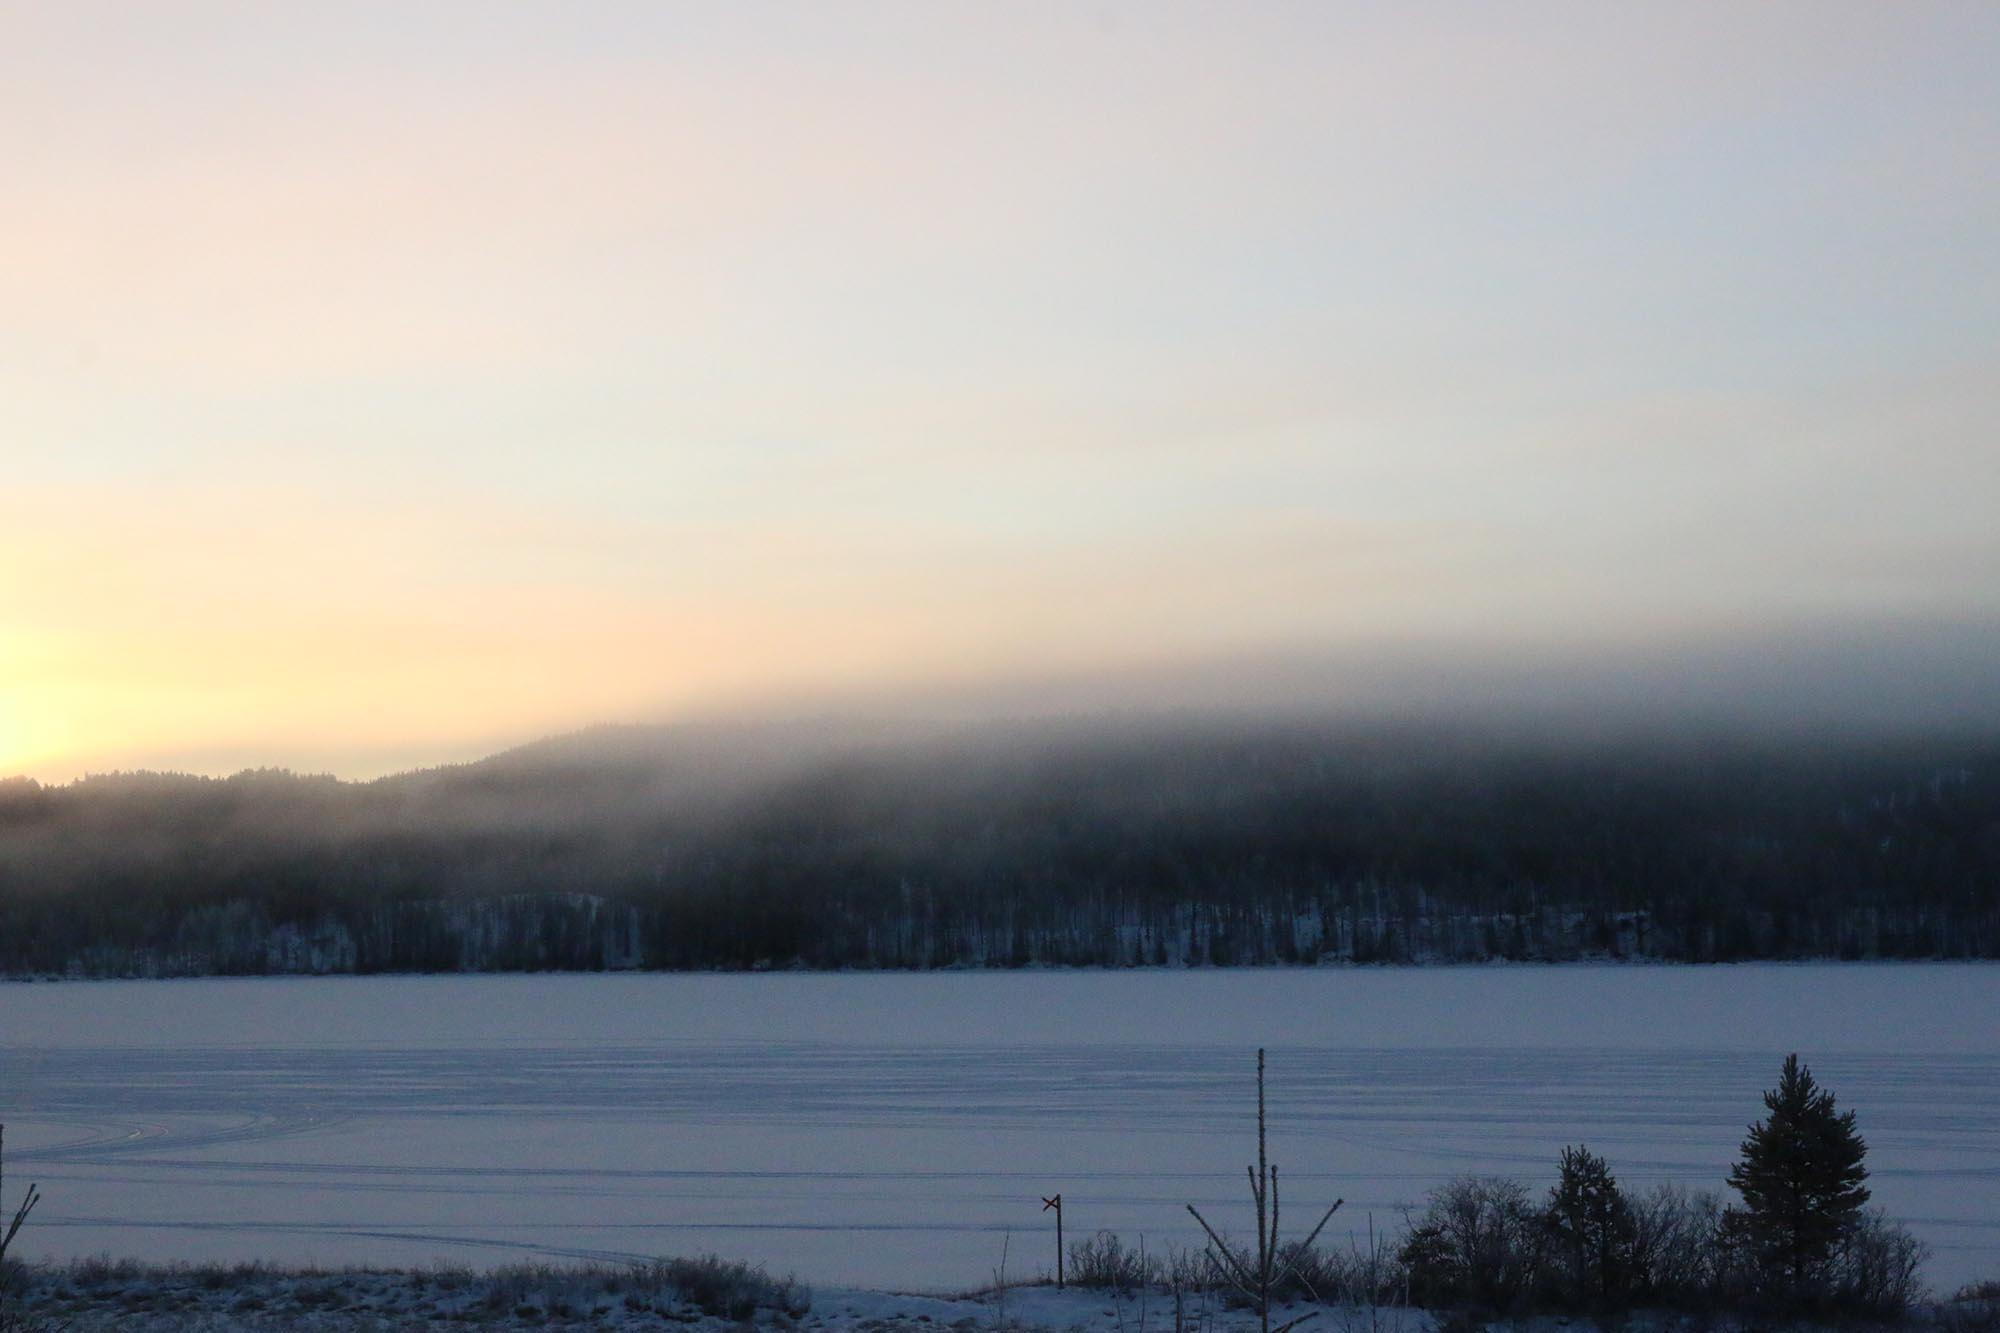 Dimma över bergen